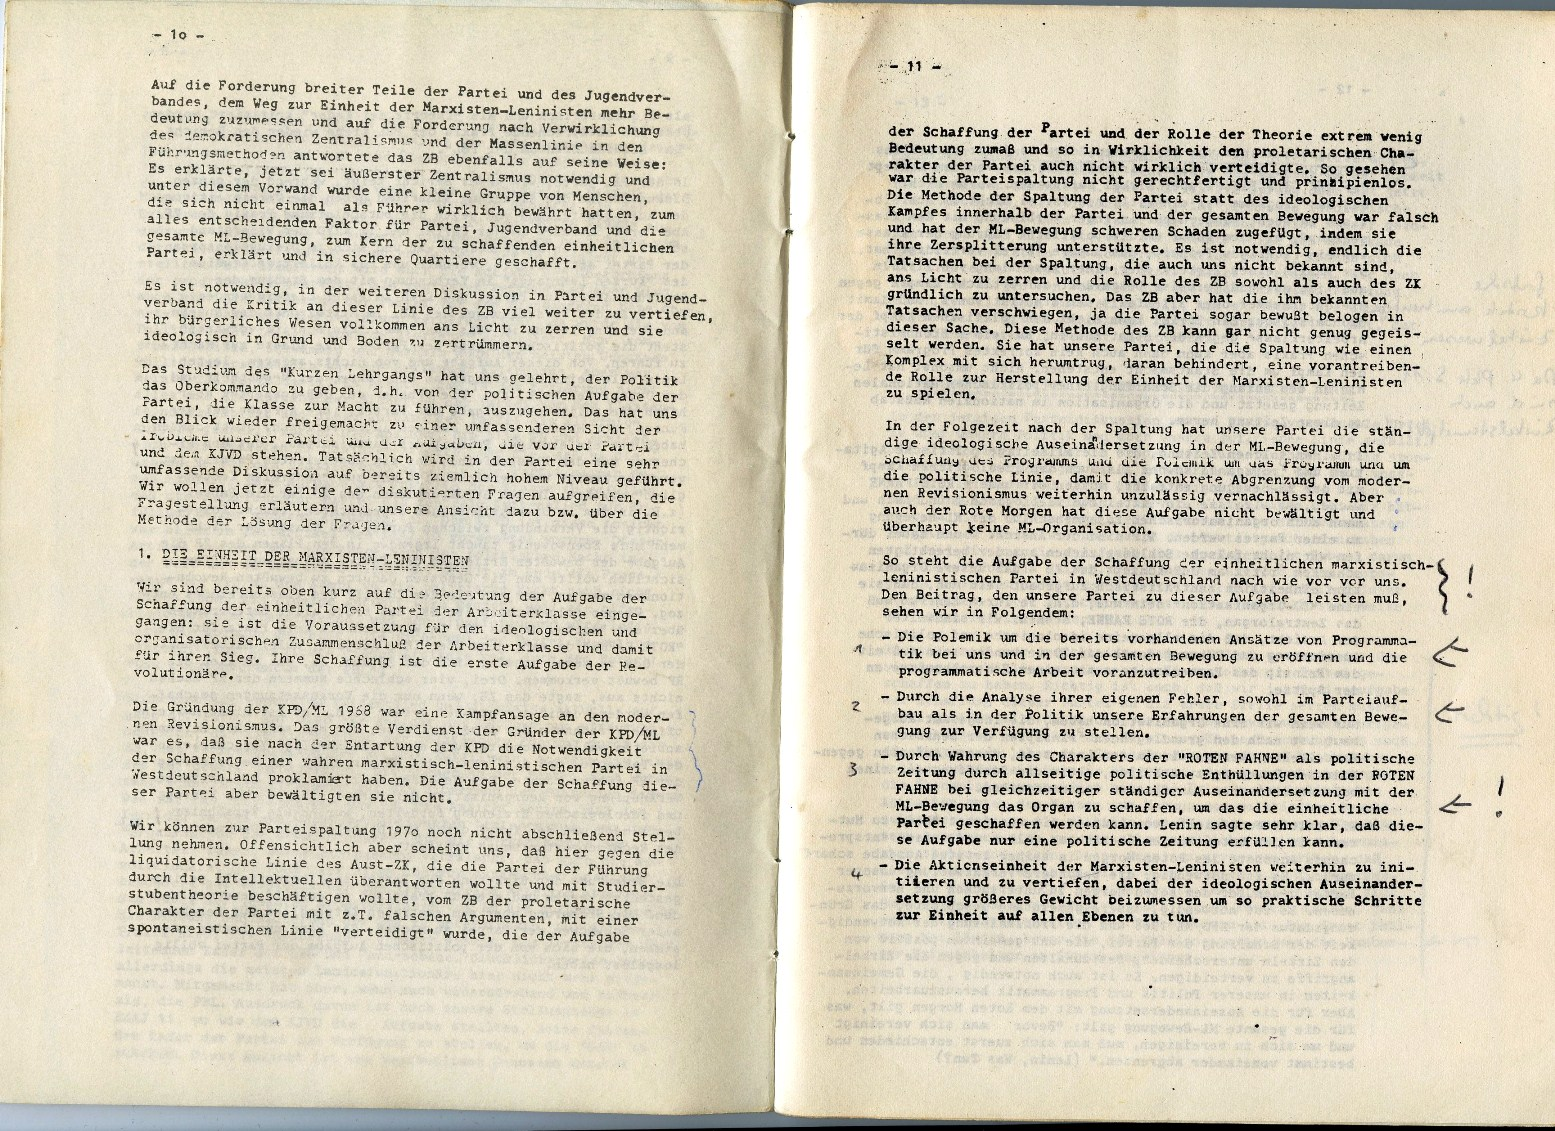 ZB_Universitas_1972_09